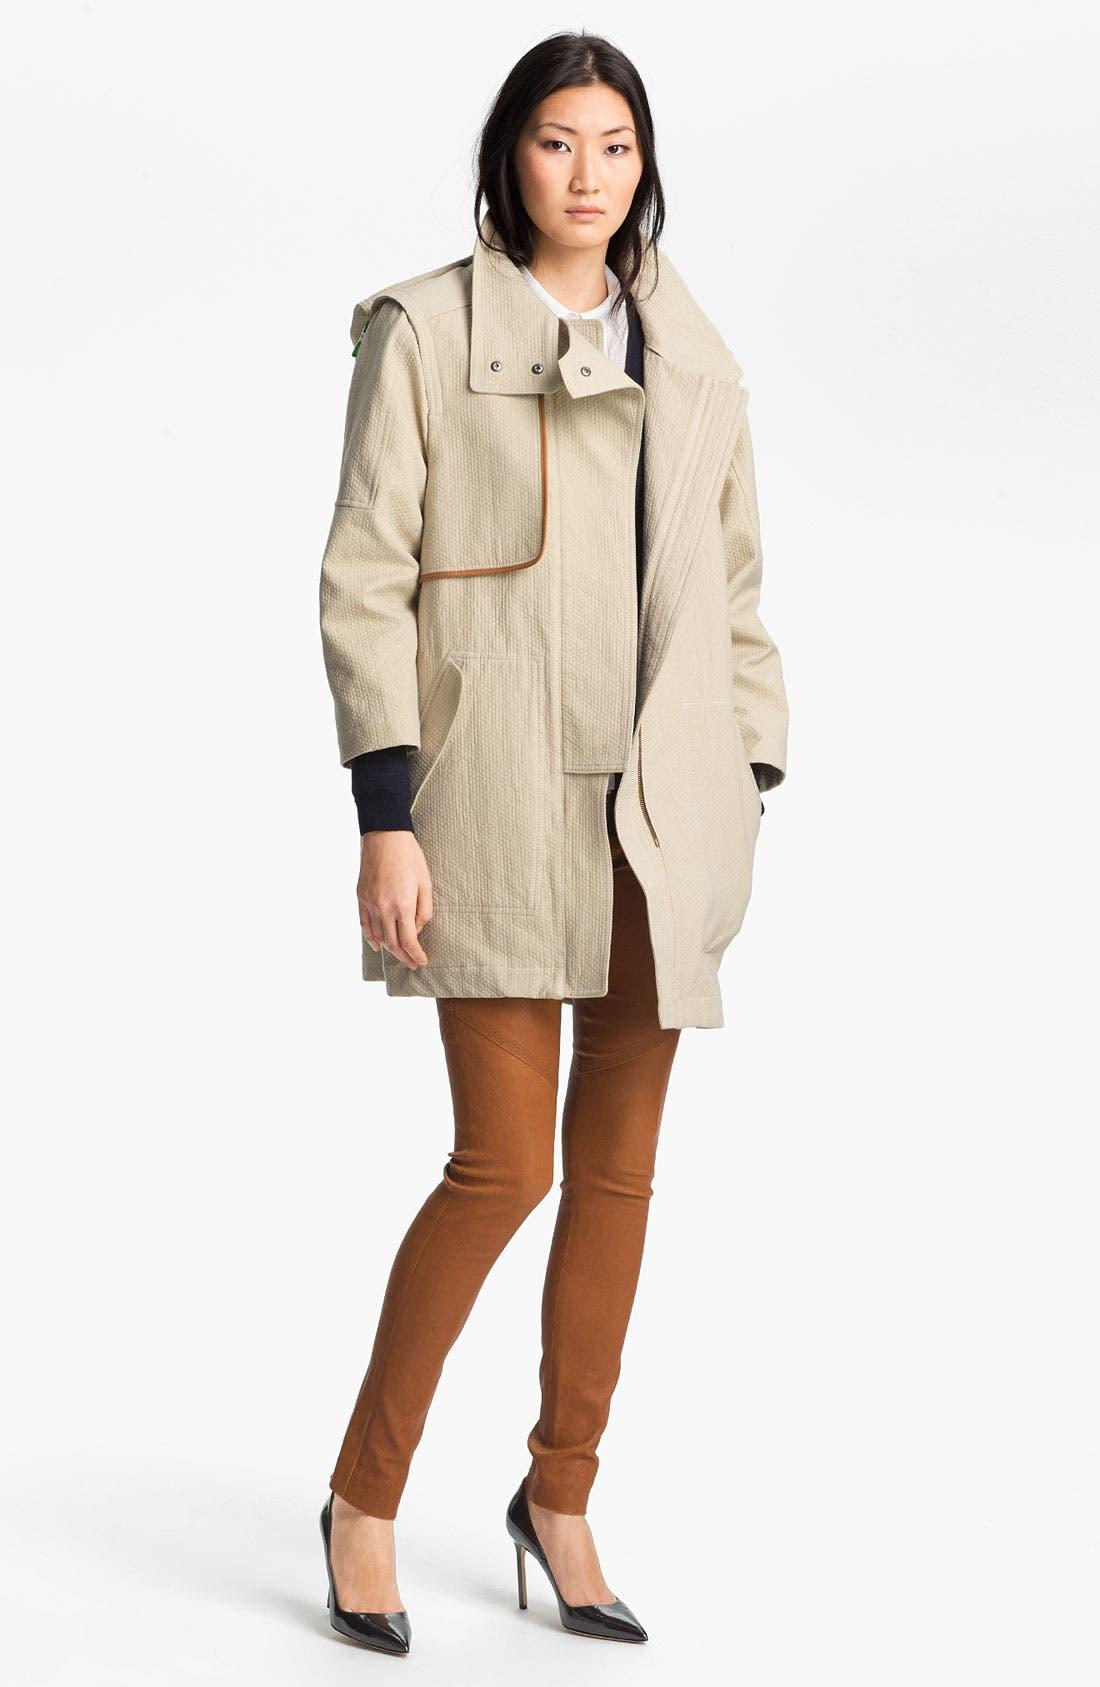 Alternate Image 1 Selected - A.L.C Coat, Sweater, Blouse & Pants